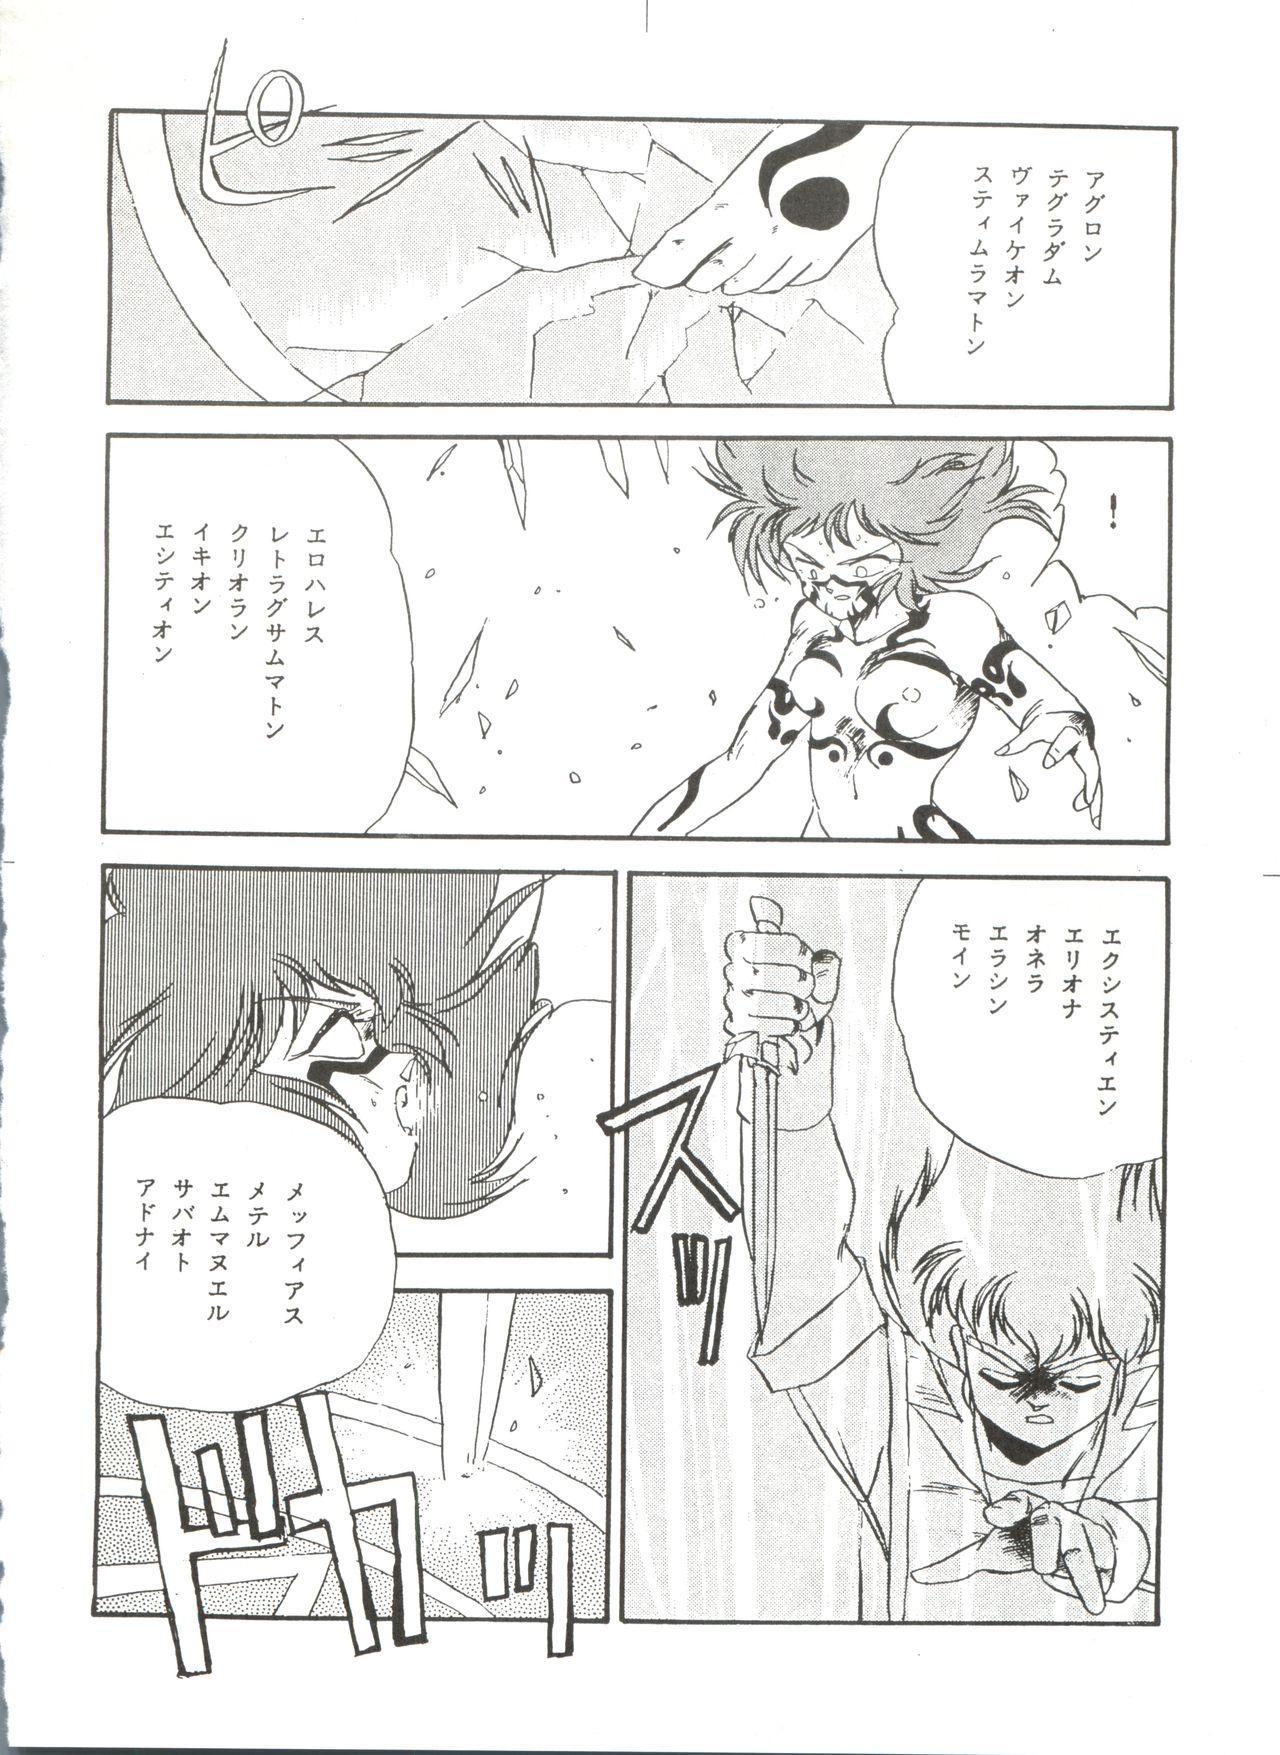 [Studio Fuck (Various) Onapet 7 (Sonic Soldier Borgman, Gundam ZZ, Osomatsu-kun) 57